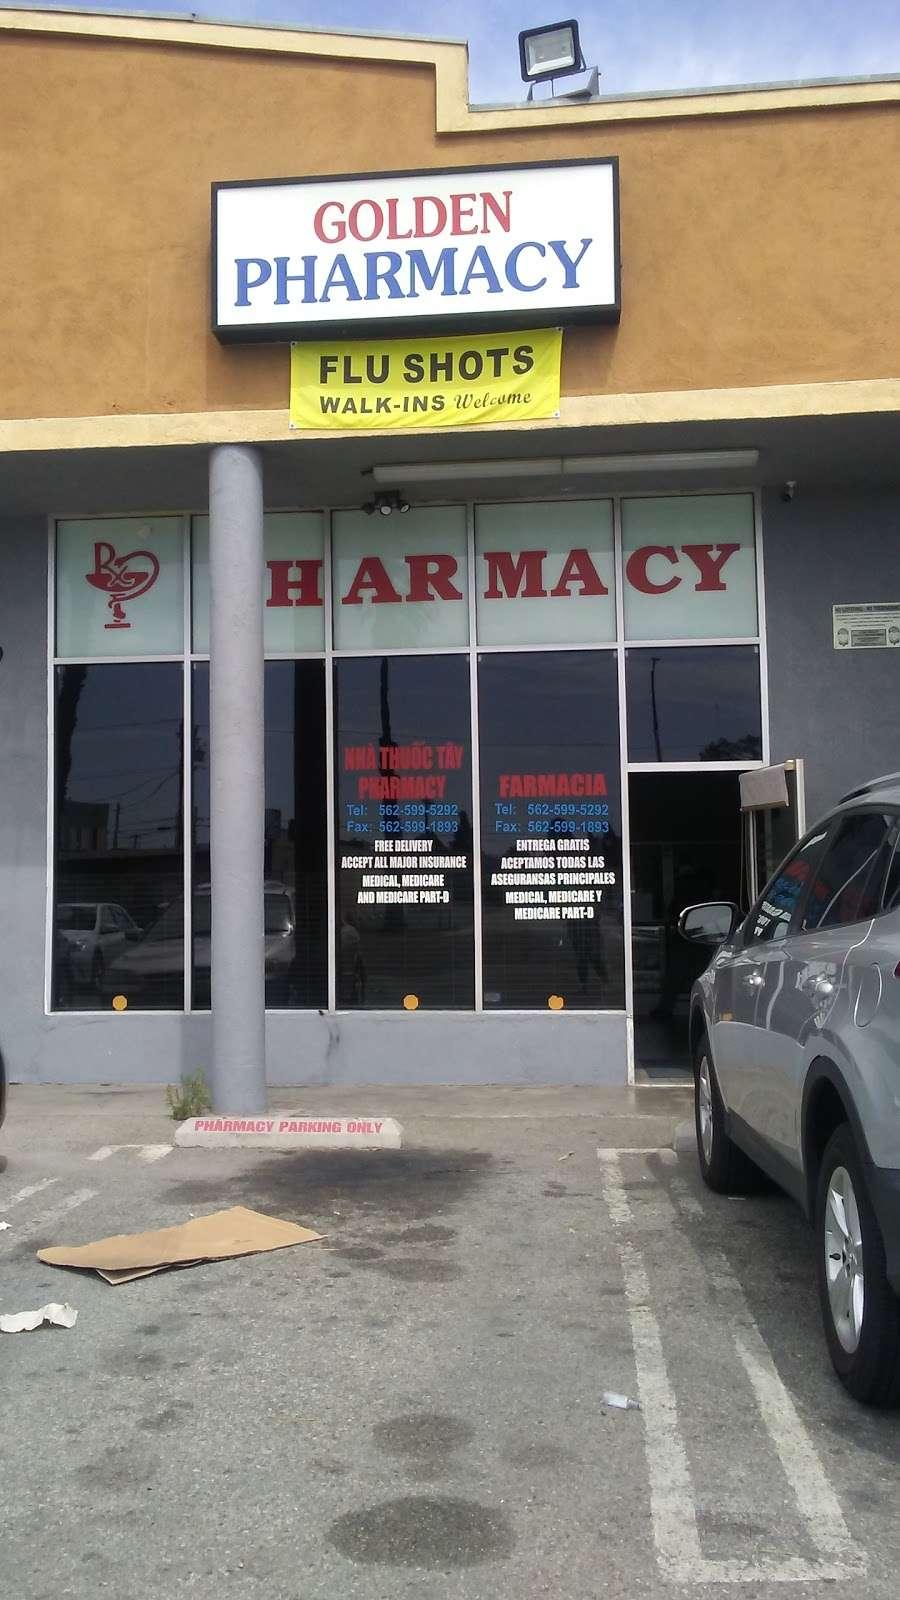 Golden Pharmacy - pharmacy    Photo 1 of 2   Address: 1750 Pacific Avenue, Long Beach, CA 90813, USA   Phone: (562) 599-5292